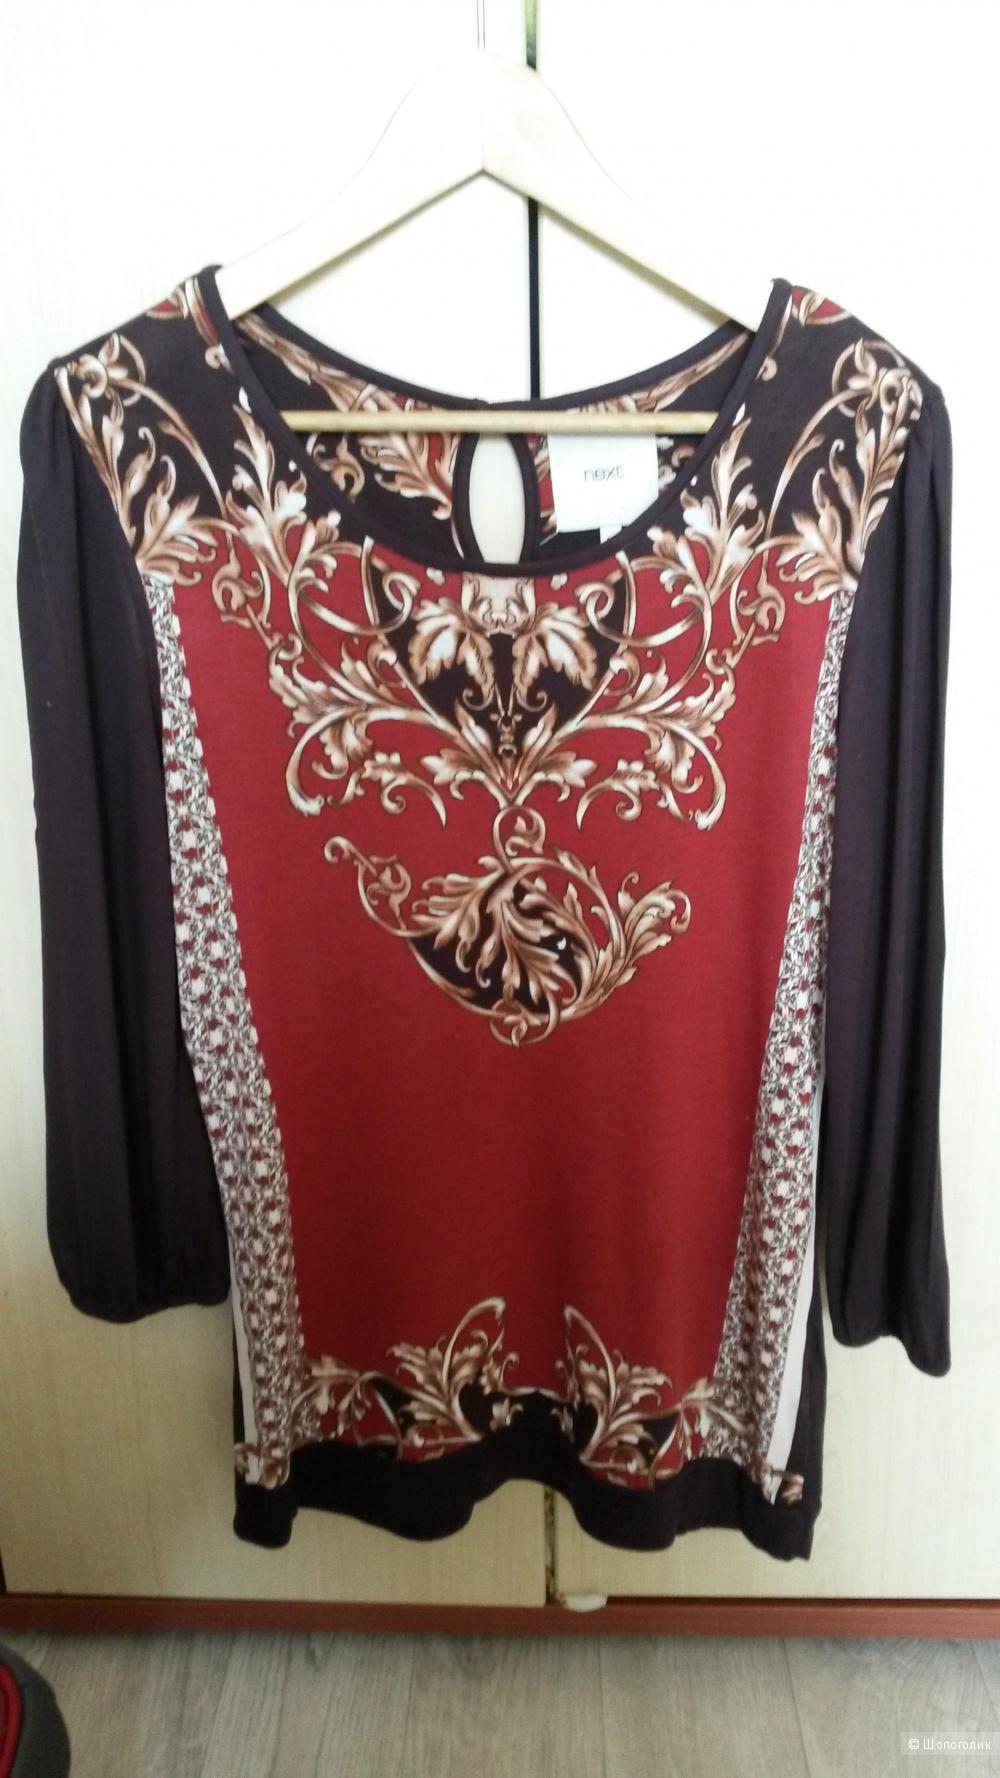 Блузка Next, размер 12 на 46рос.Цвет бордо